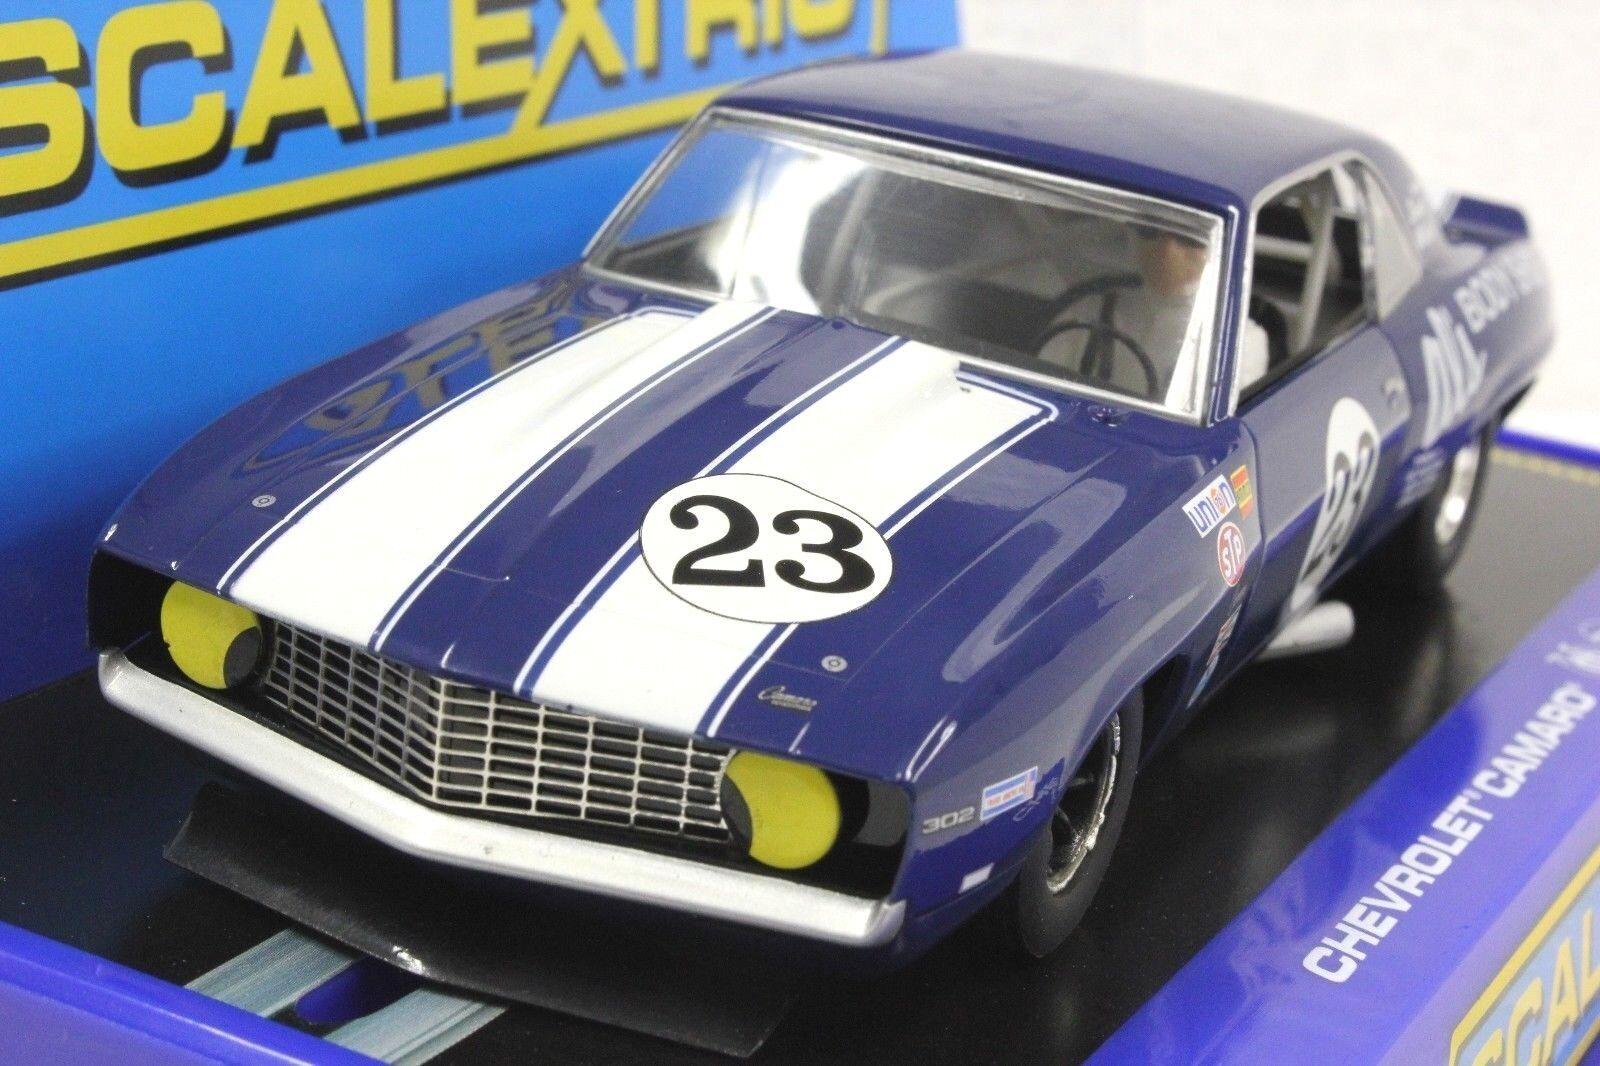 Scalextric C3532'69 Chevrolet Camaro Z28 Trans Am,  23 1 32 SLOT CAR  RMR